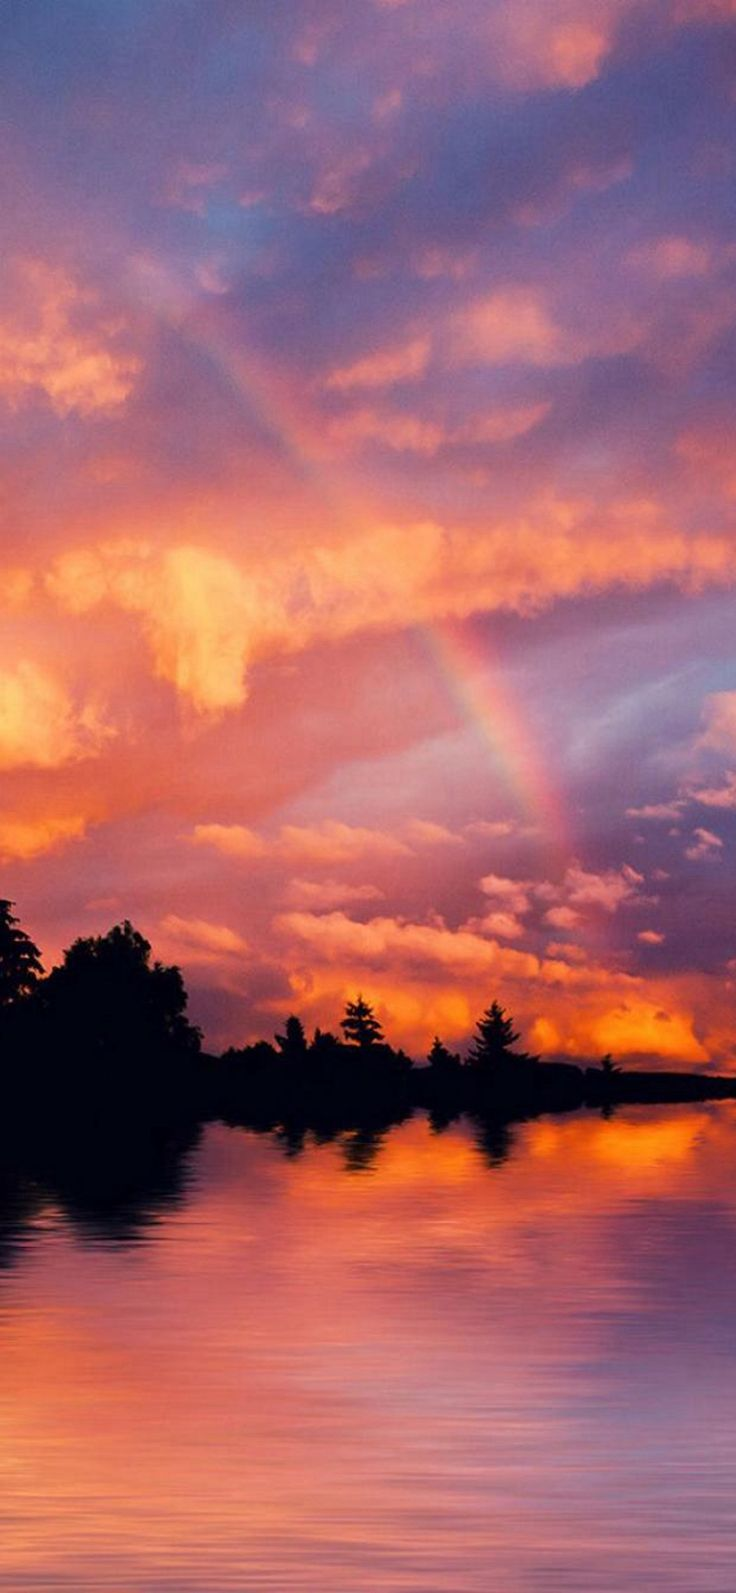 Nature Wonderful Colorful Sunset River Bank Landscape #iPhone #X #wallpaper